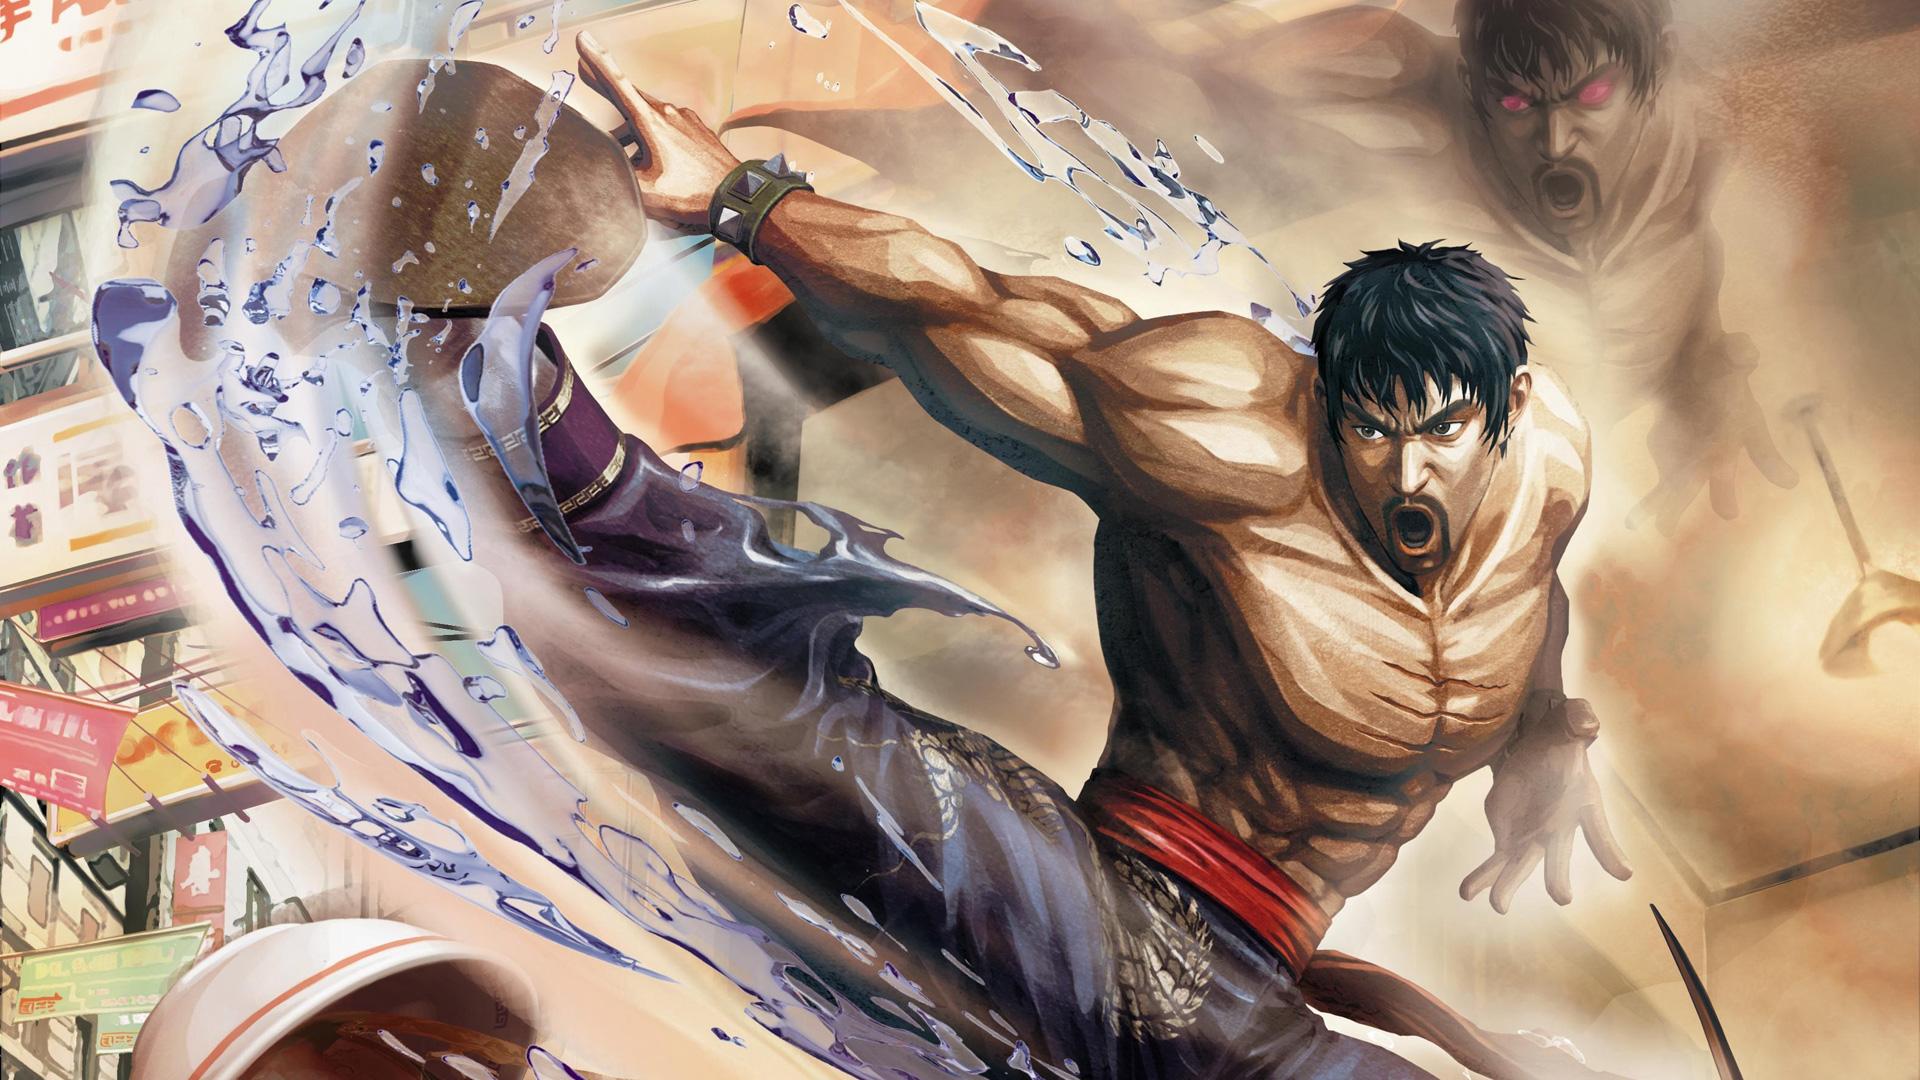 Street Fighter X Tekken Wallpaper in 1920x1080